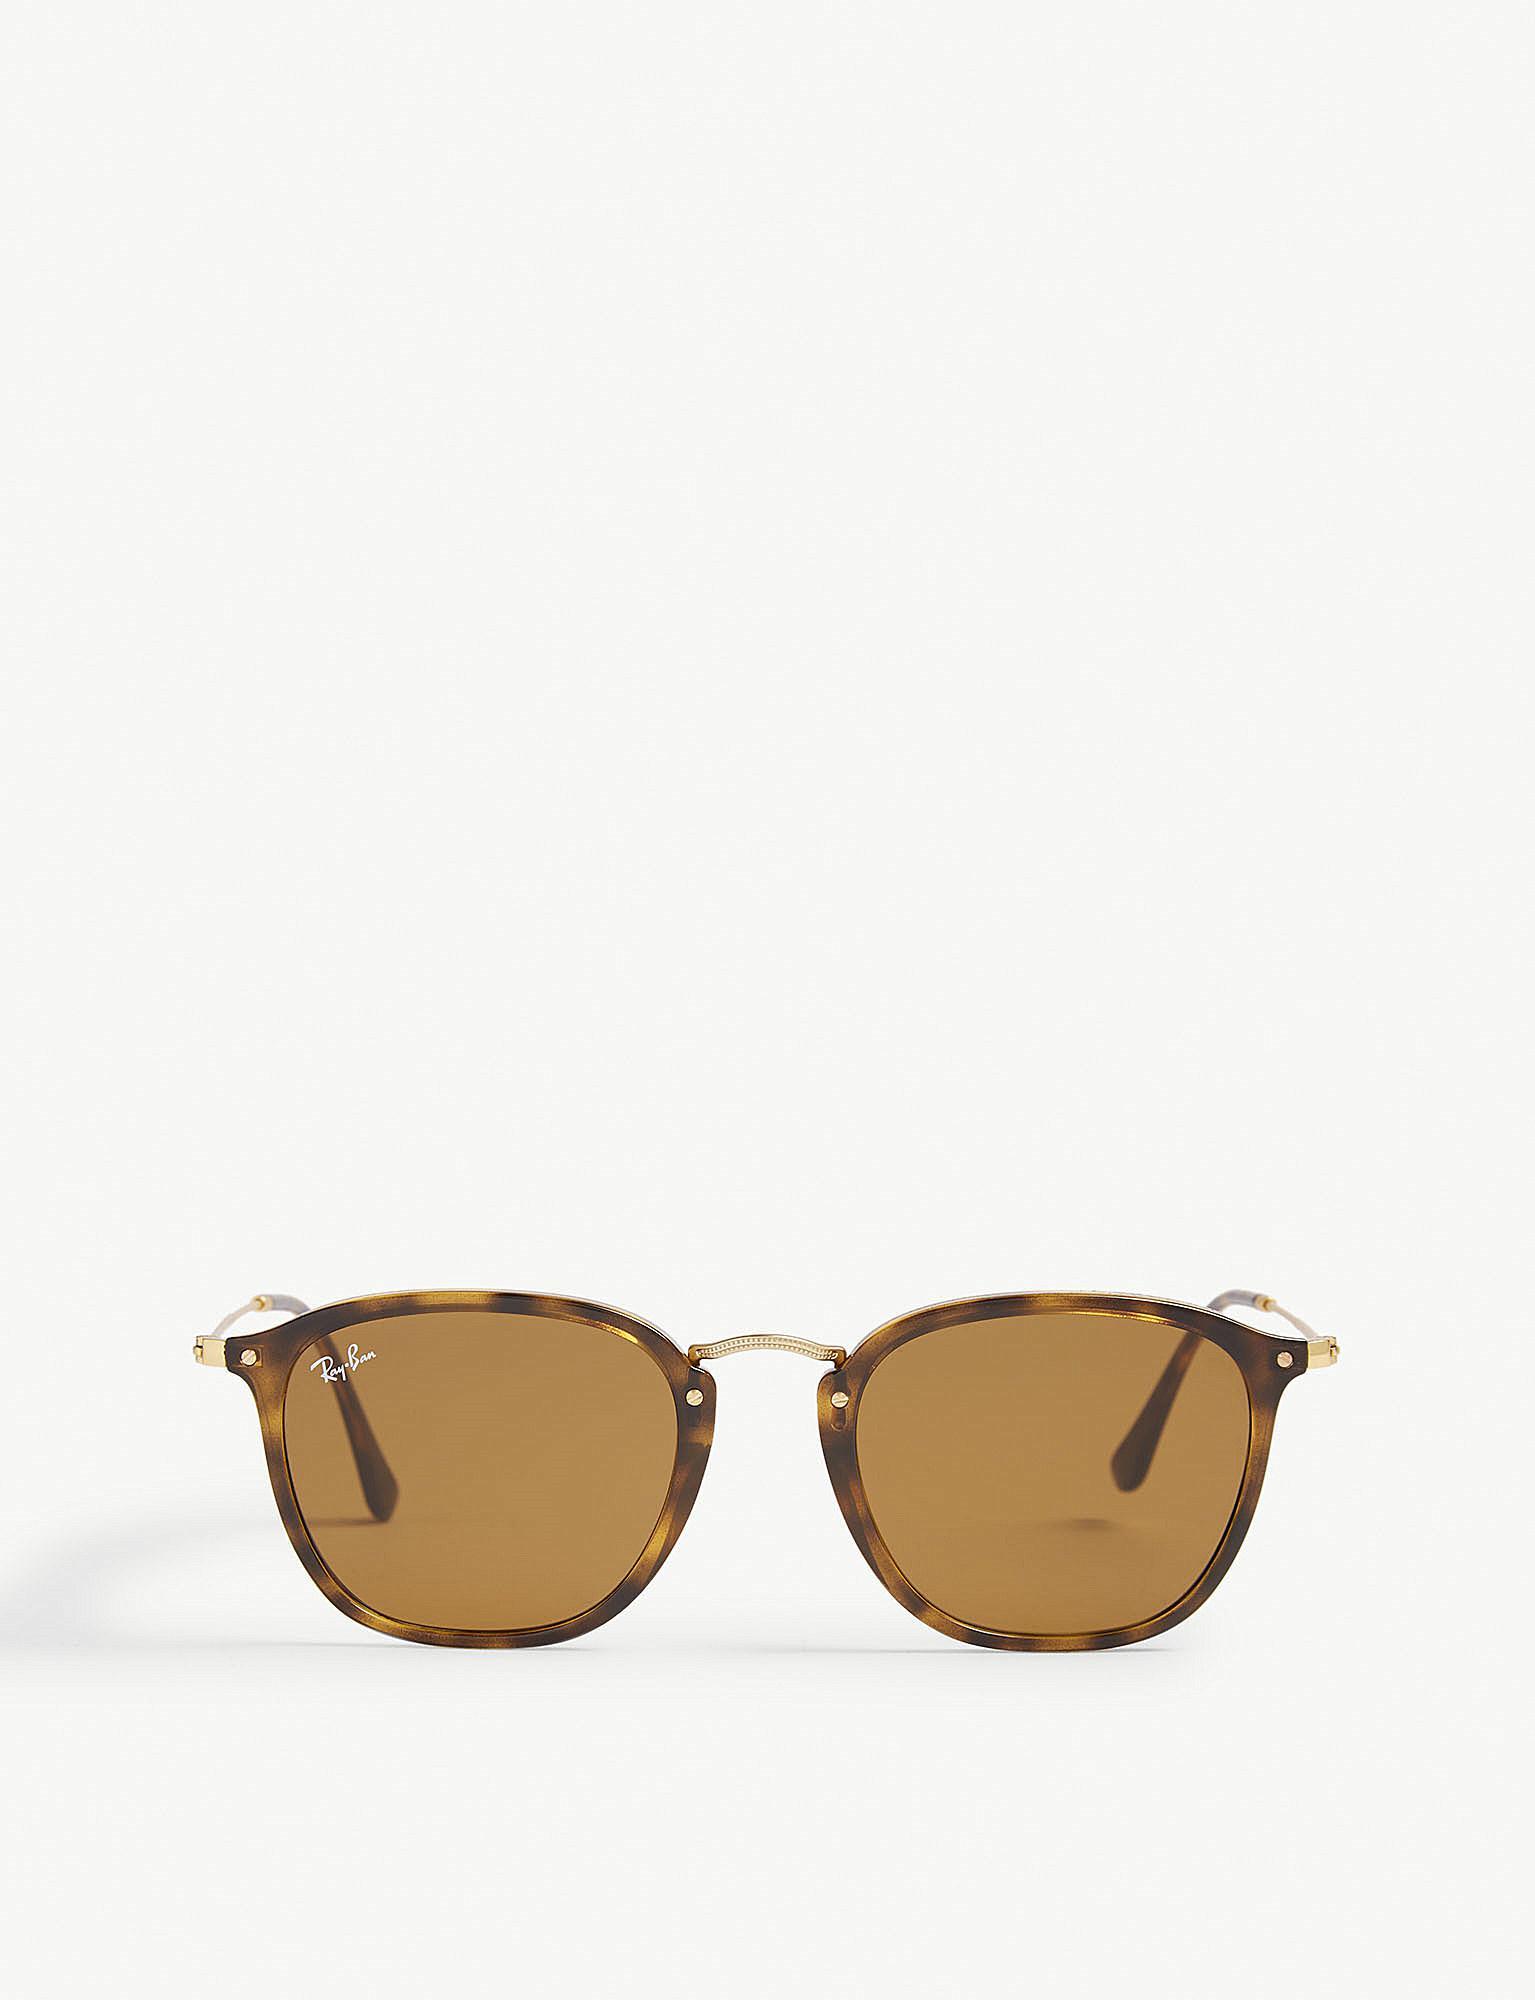 808c4411ecffa Lyst - Ray-Ban Havana Rb2448n Square-frame Sunglasses in Brown